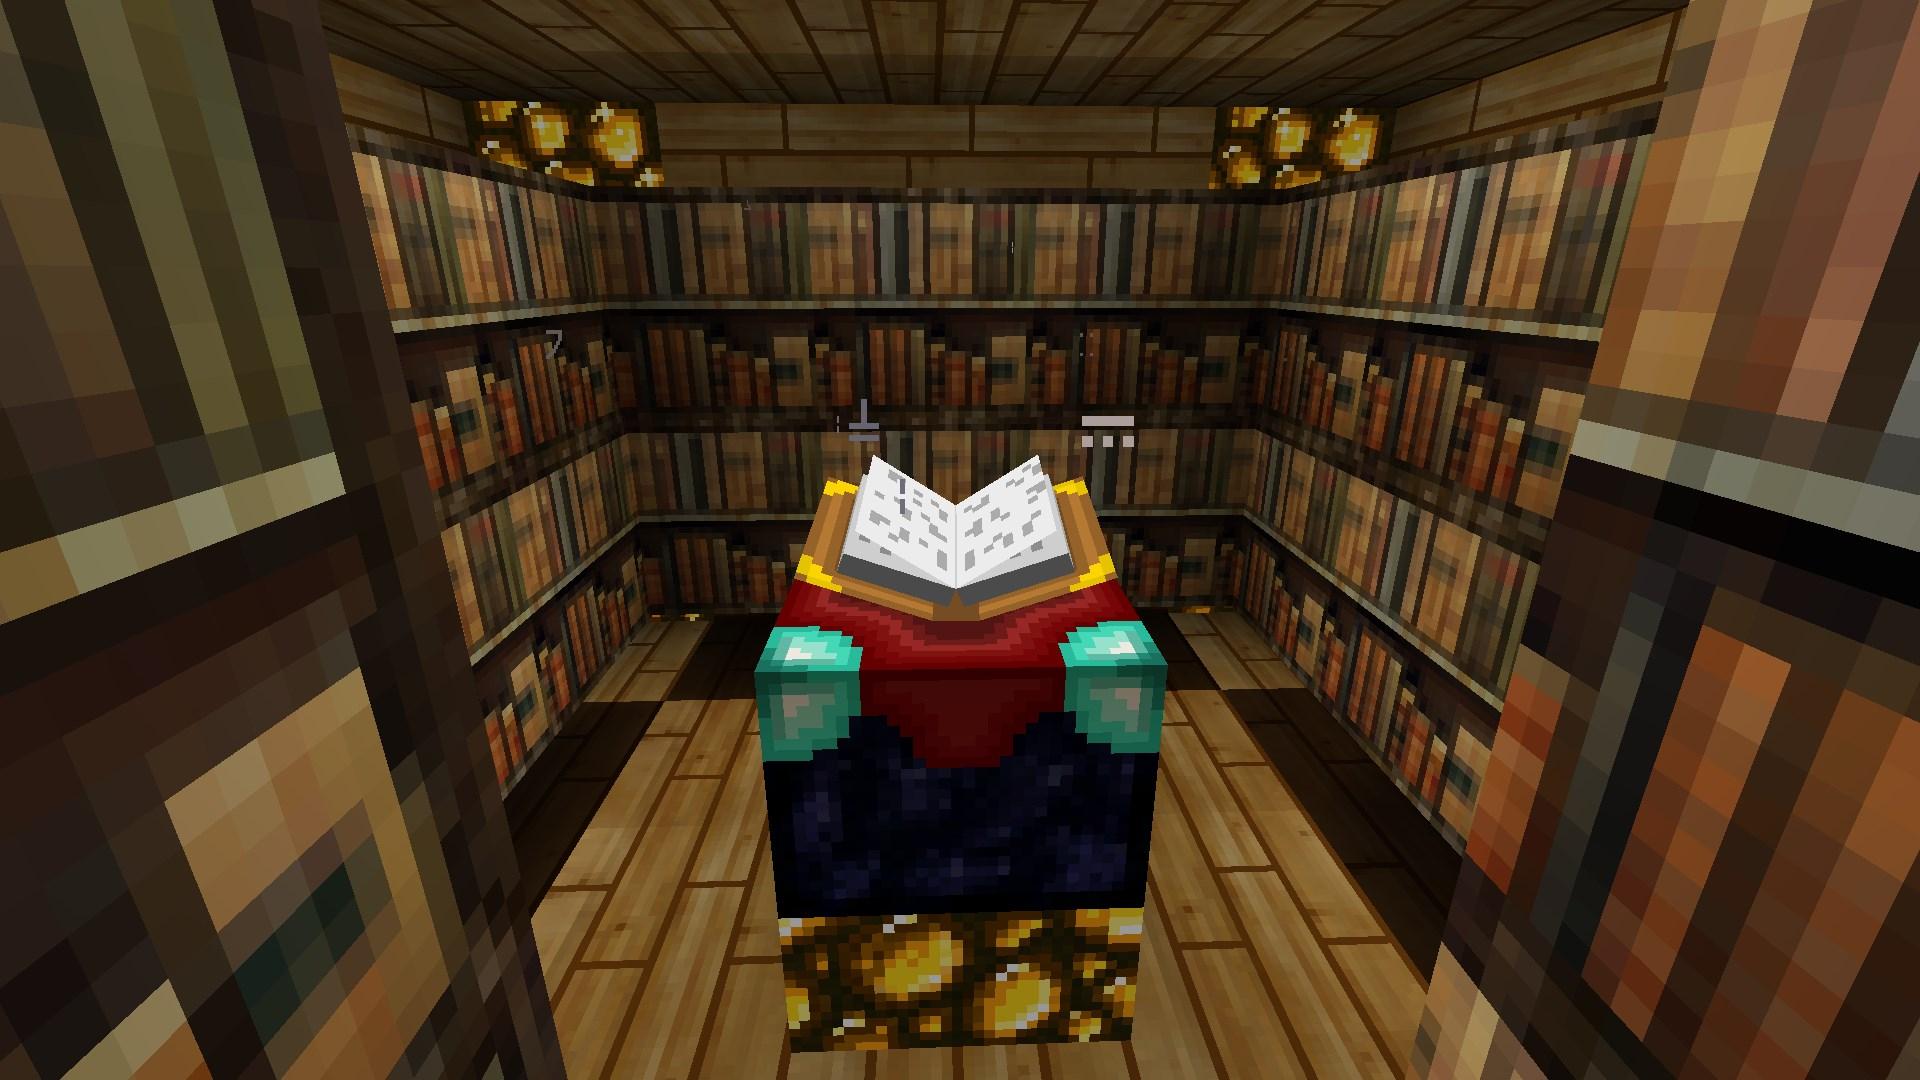 Minecraft utopia 9 by springsts on deviantart - Table d enchantement minecraft ...